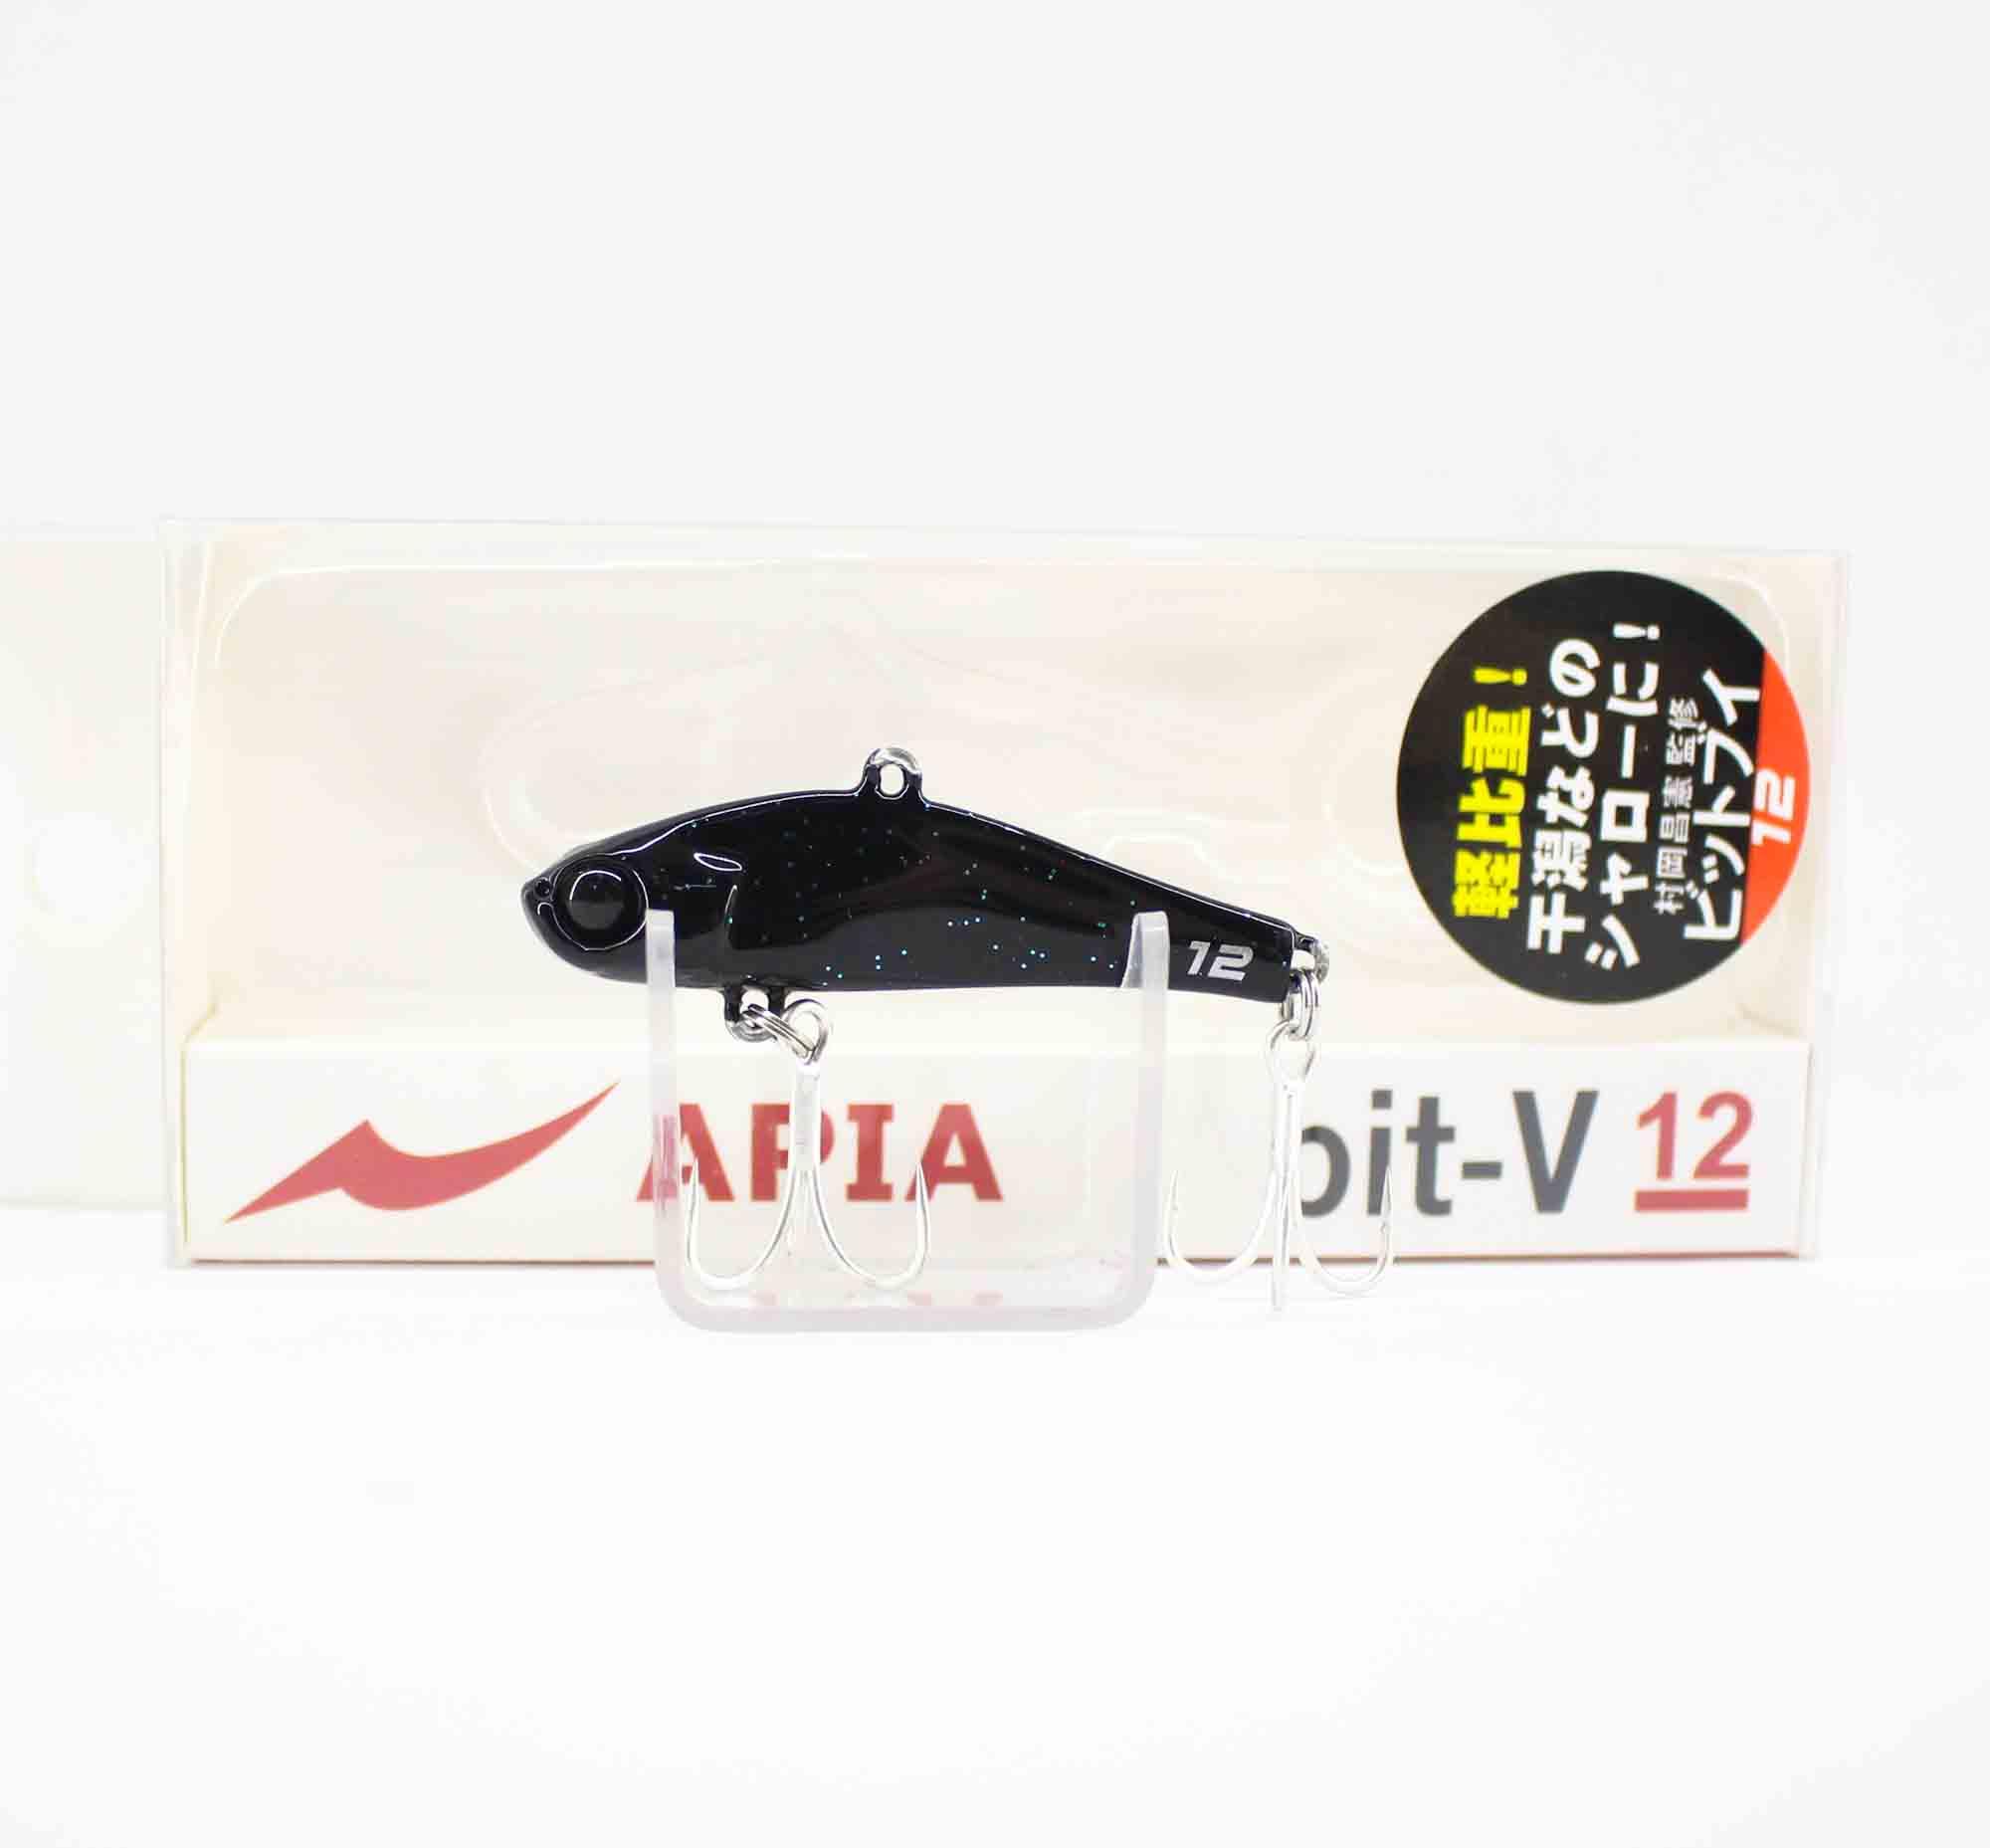 Apia Bit-V Metal Vibration 12 grams Sinking Lure 19 (0627)